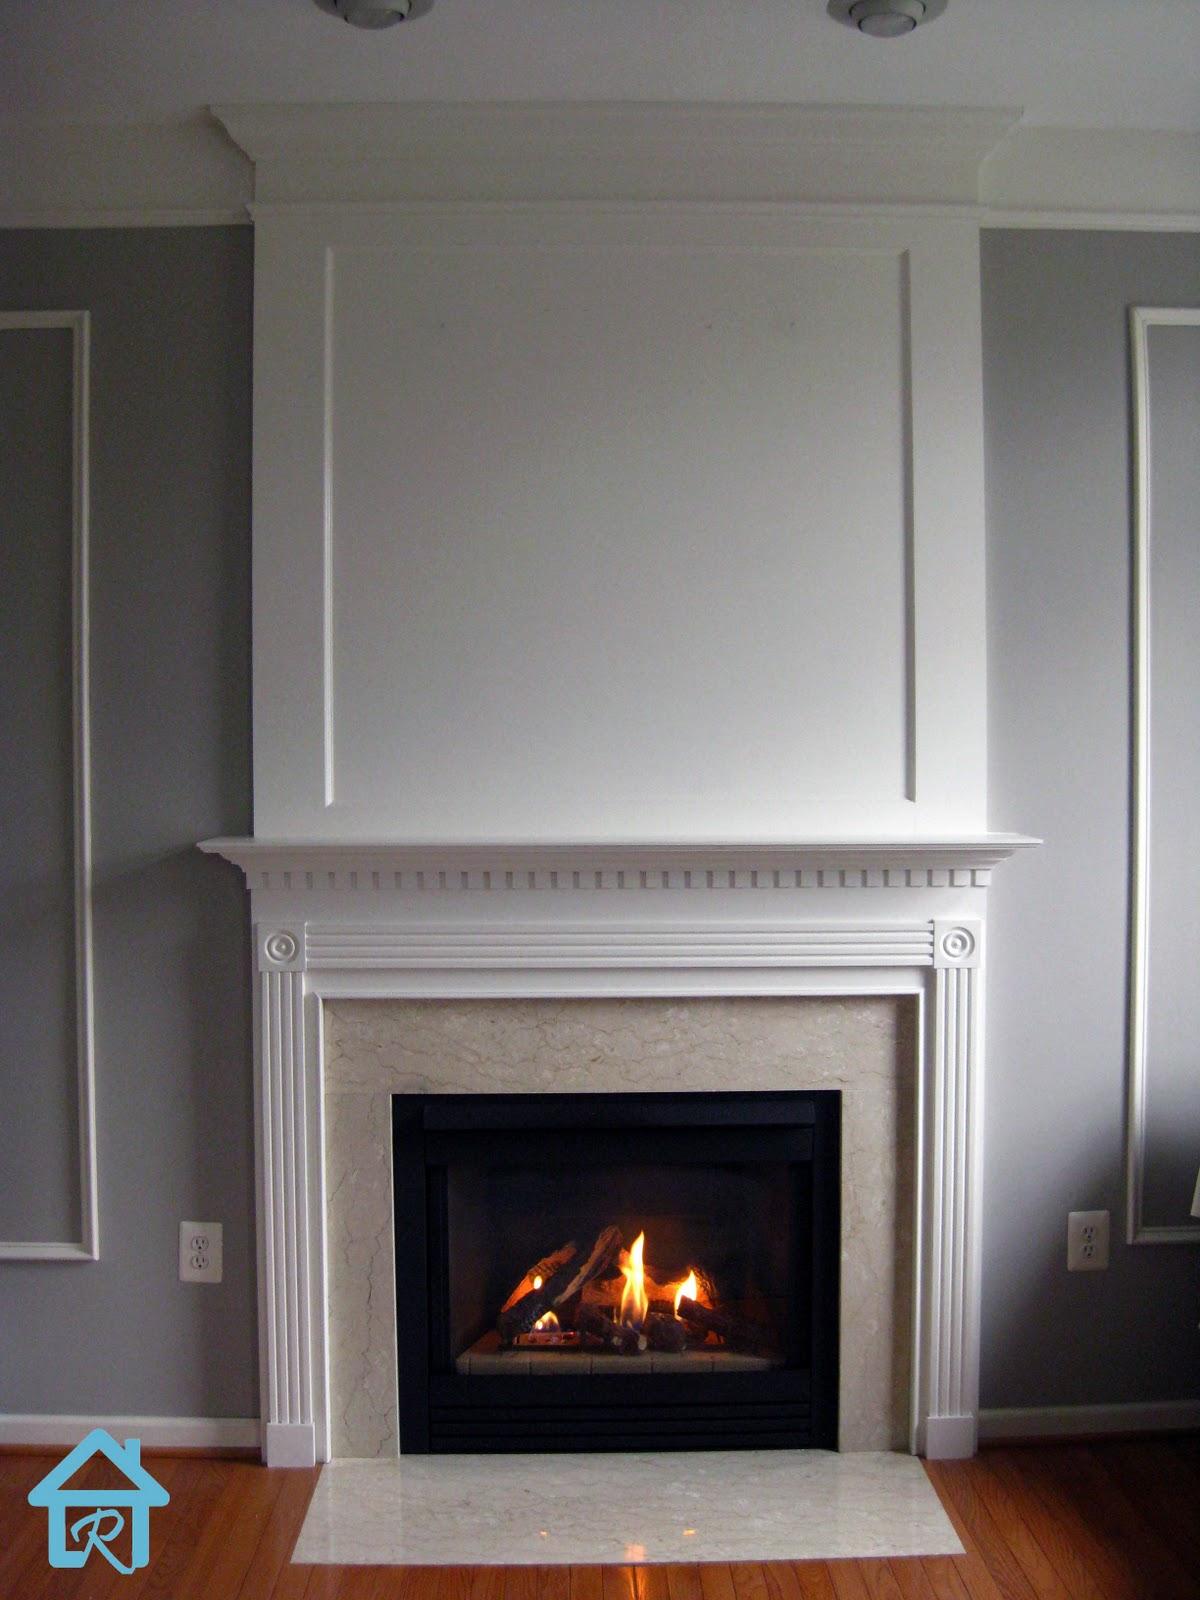 Remodelando la Casa: Adding Visual Interest and Height to